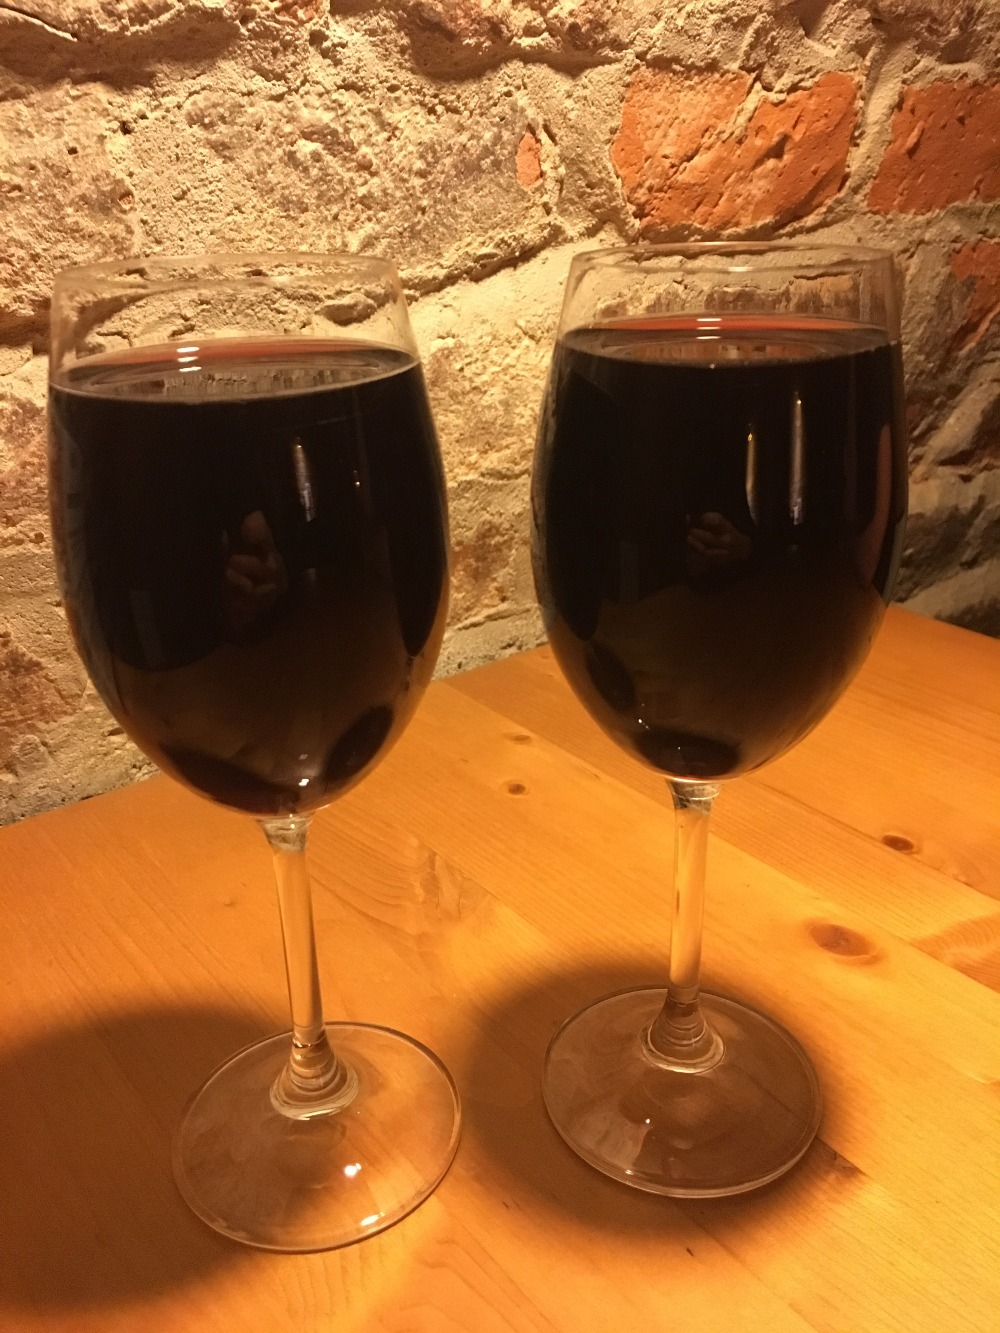 Quite a full glass pour at the neighborhood vinotéka